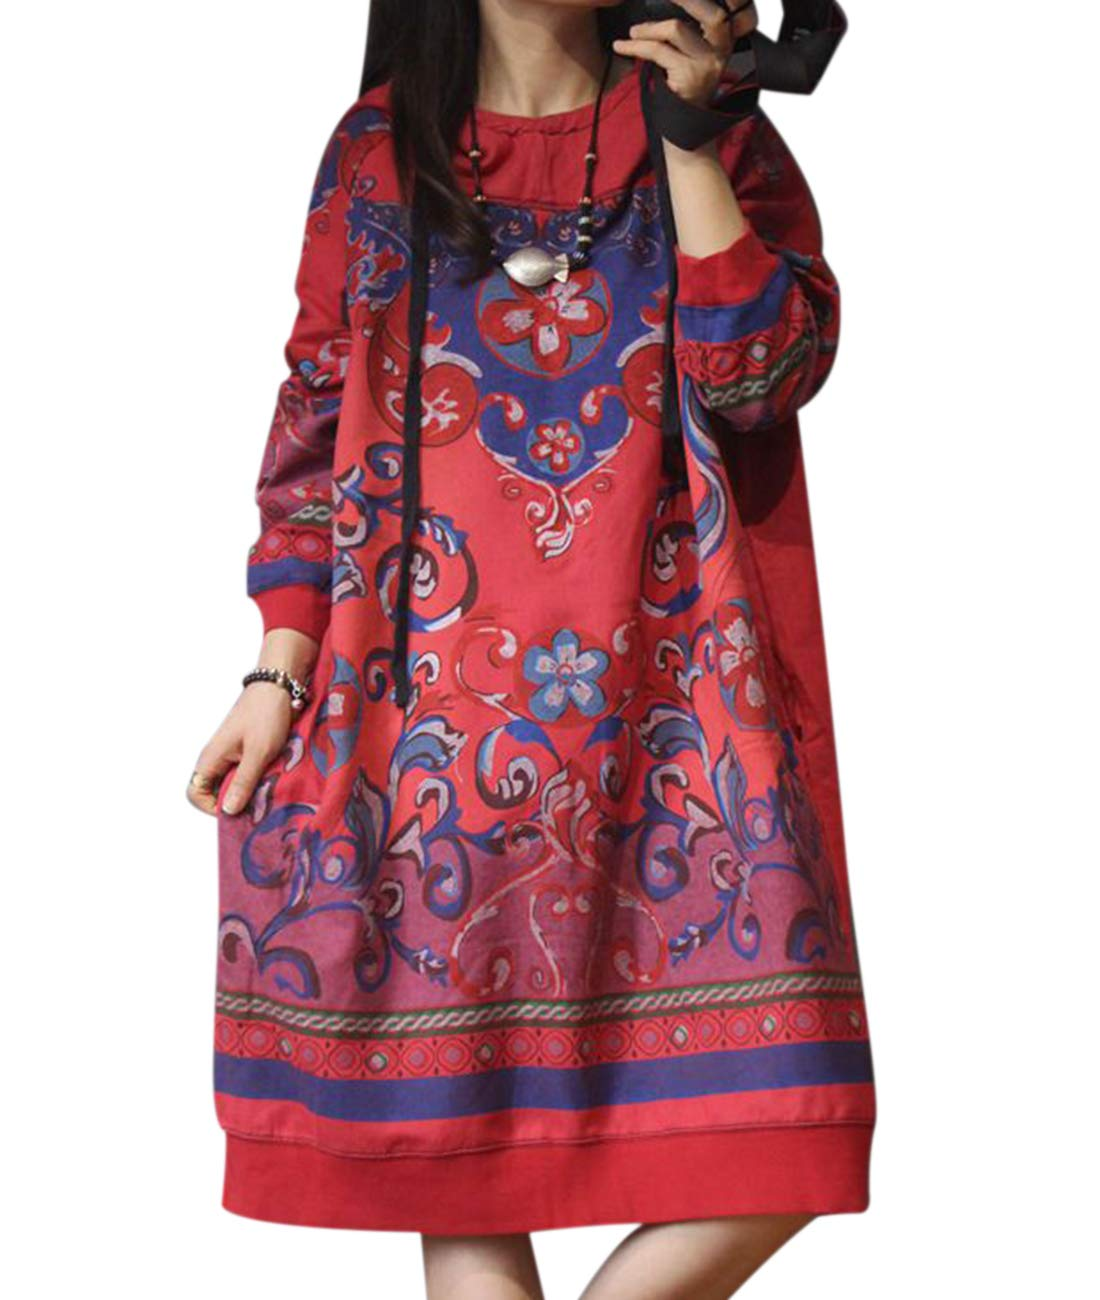 YESNO YM7 Women Casual Loose Hooded Sweatshirt Dress Plus Size Ethnic Floral Outwear Long Sleeve/Pockets